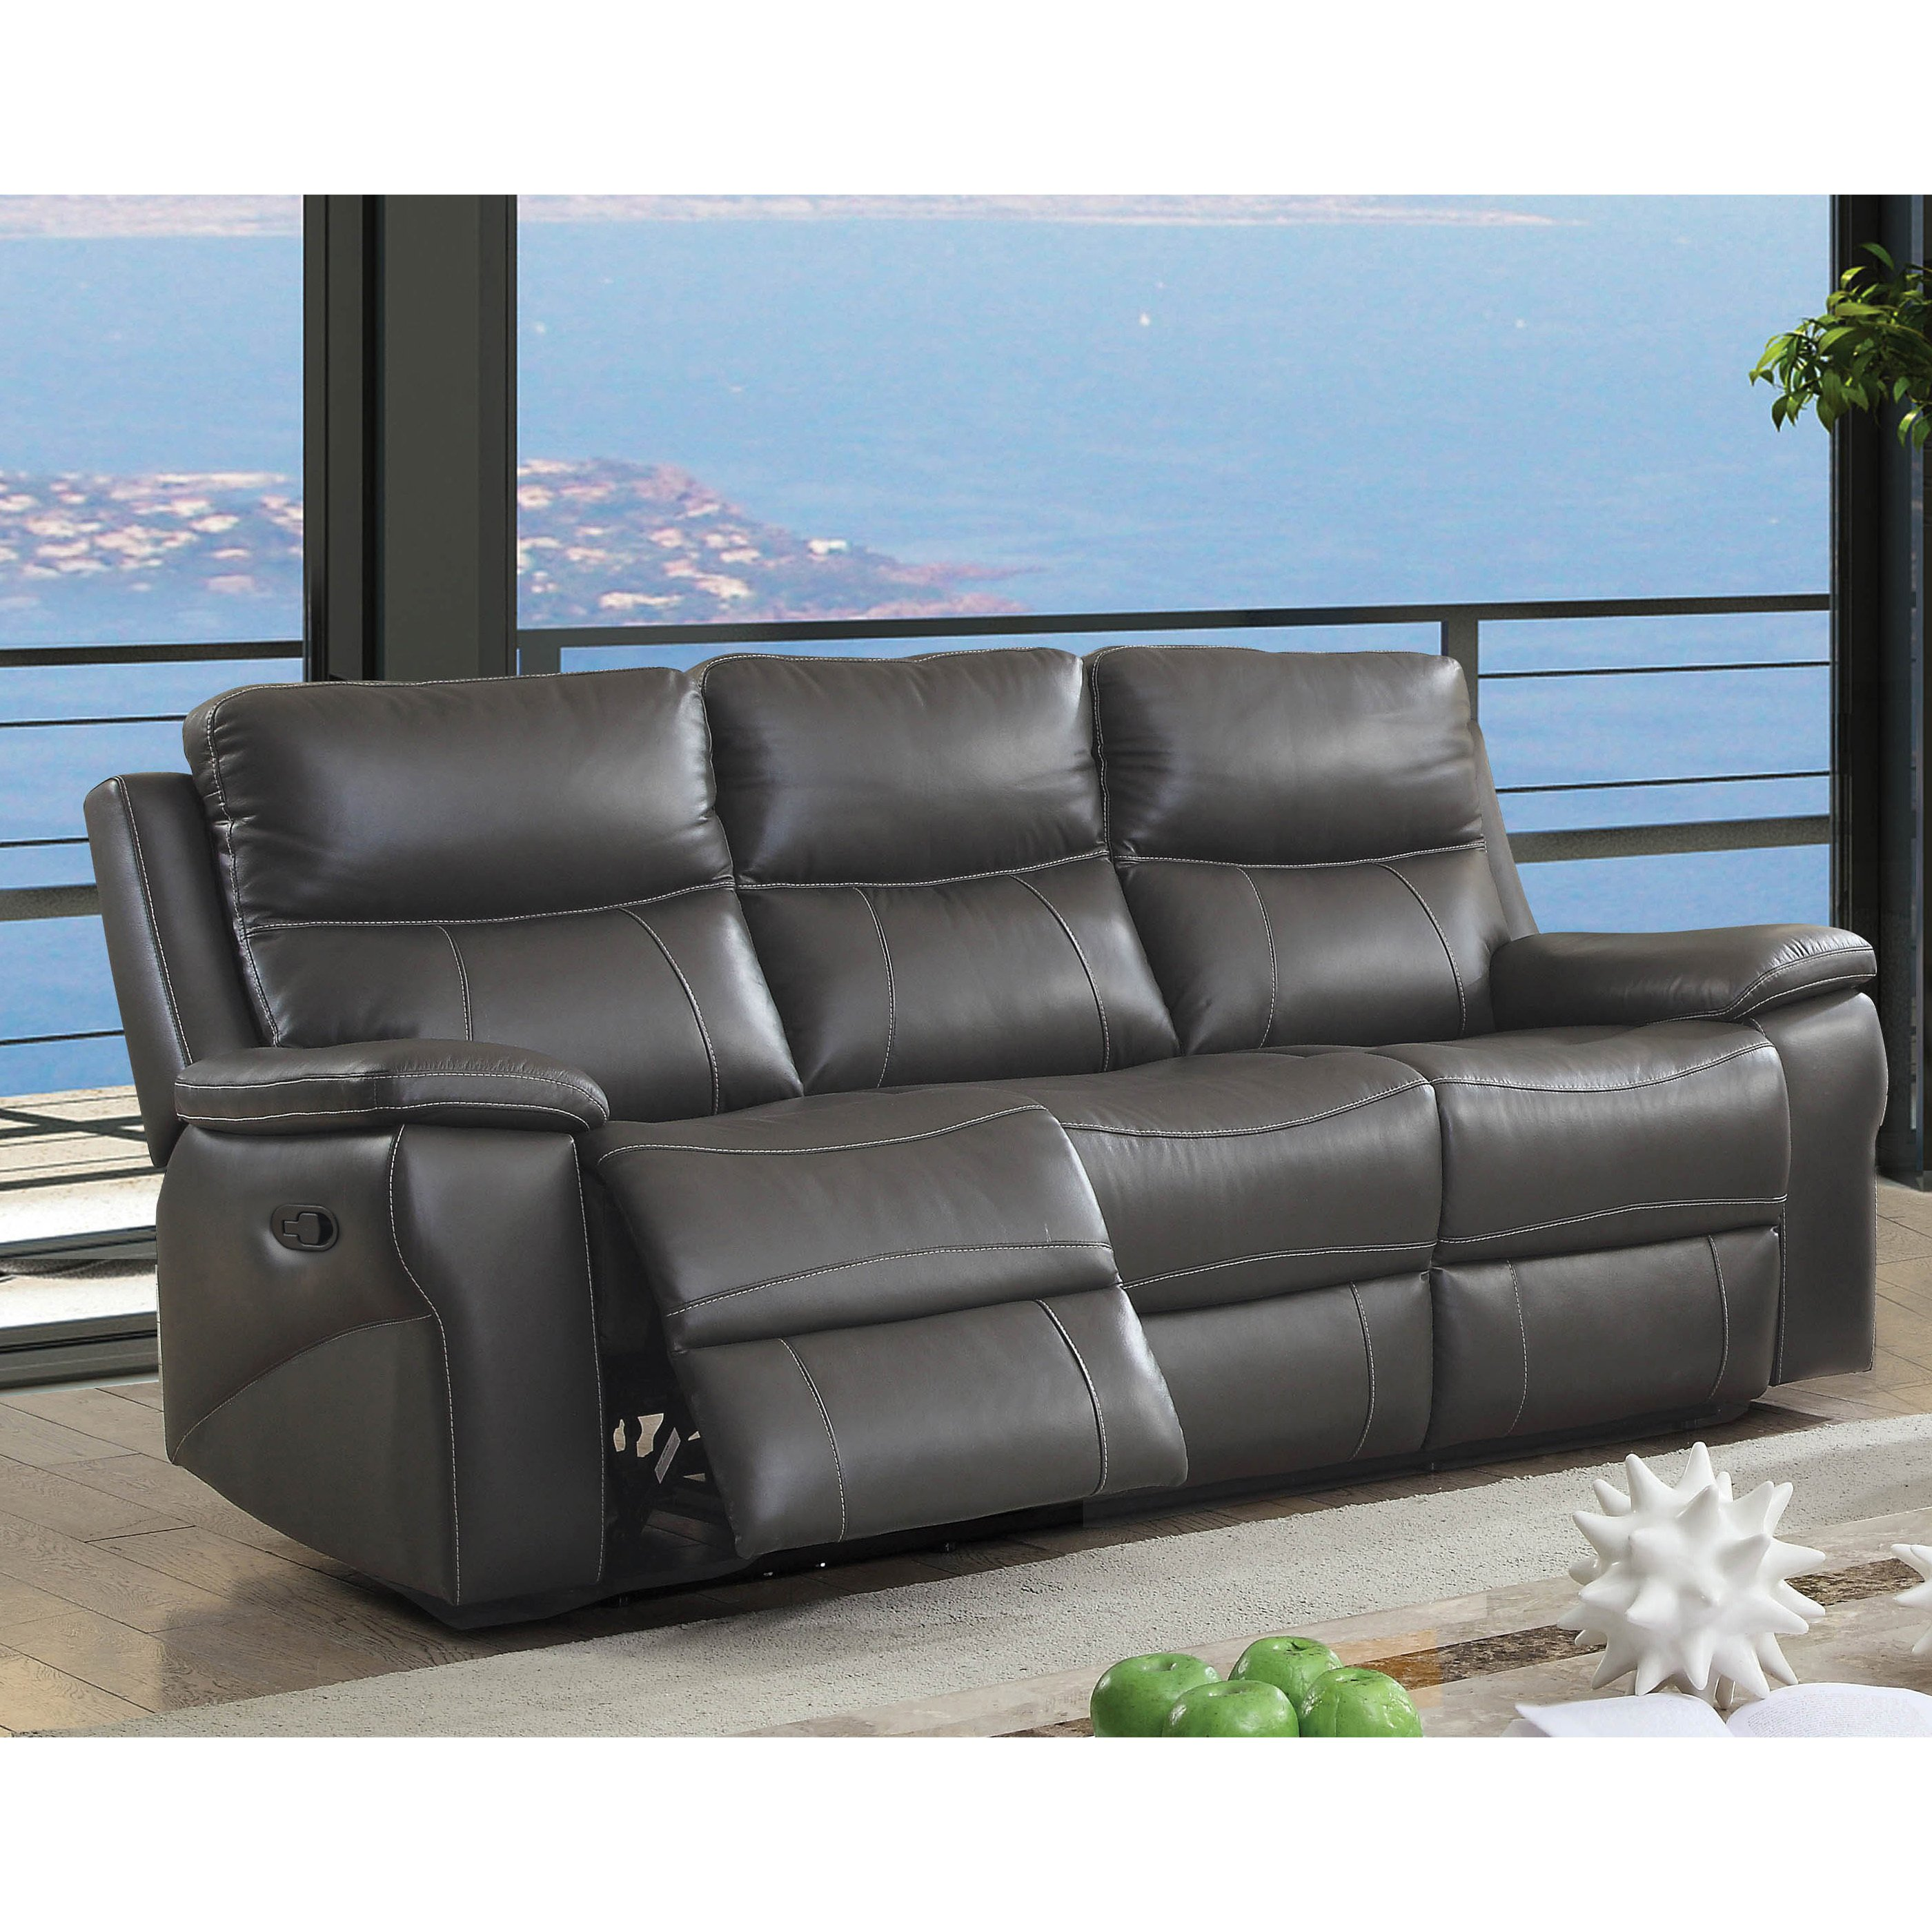 Miraculous Maruna Transitional Grey Reclining Sofa By Foa Grey Gray Machost Co Dining Chair Design Ideas Machostcouk